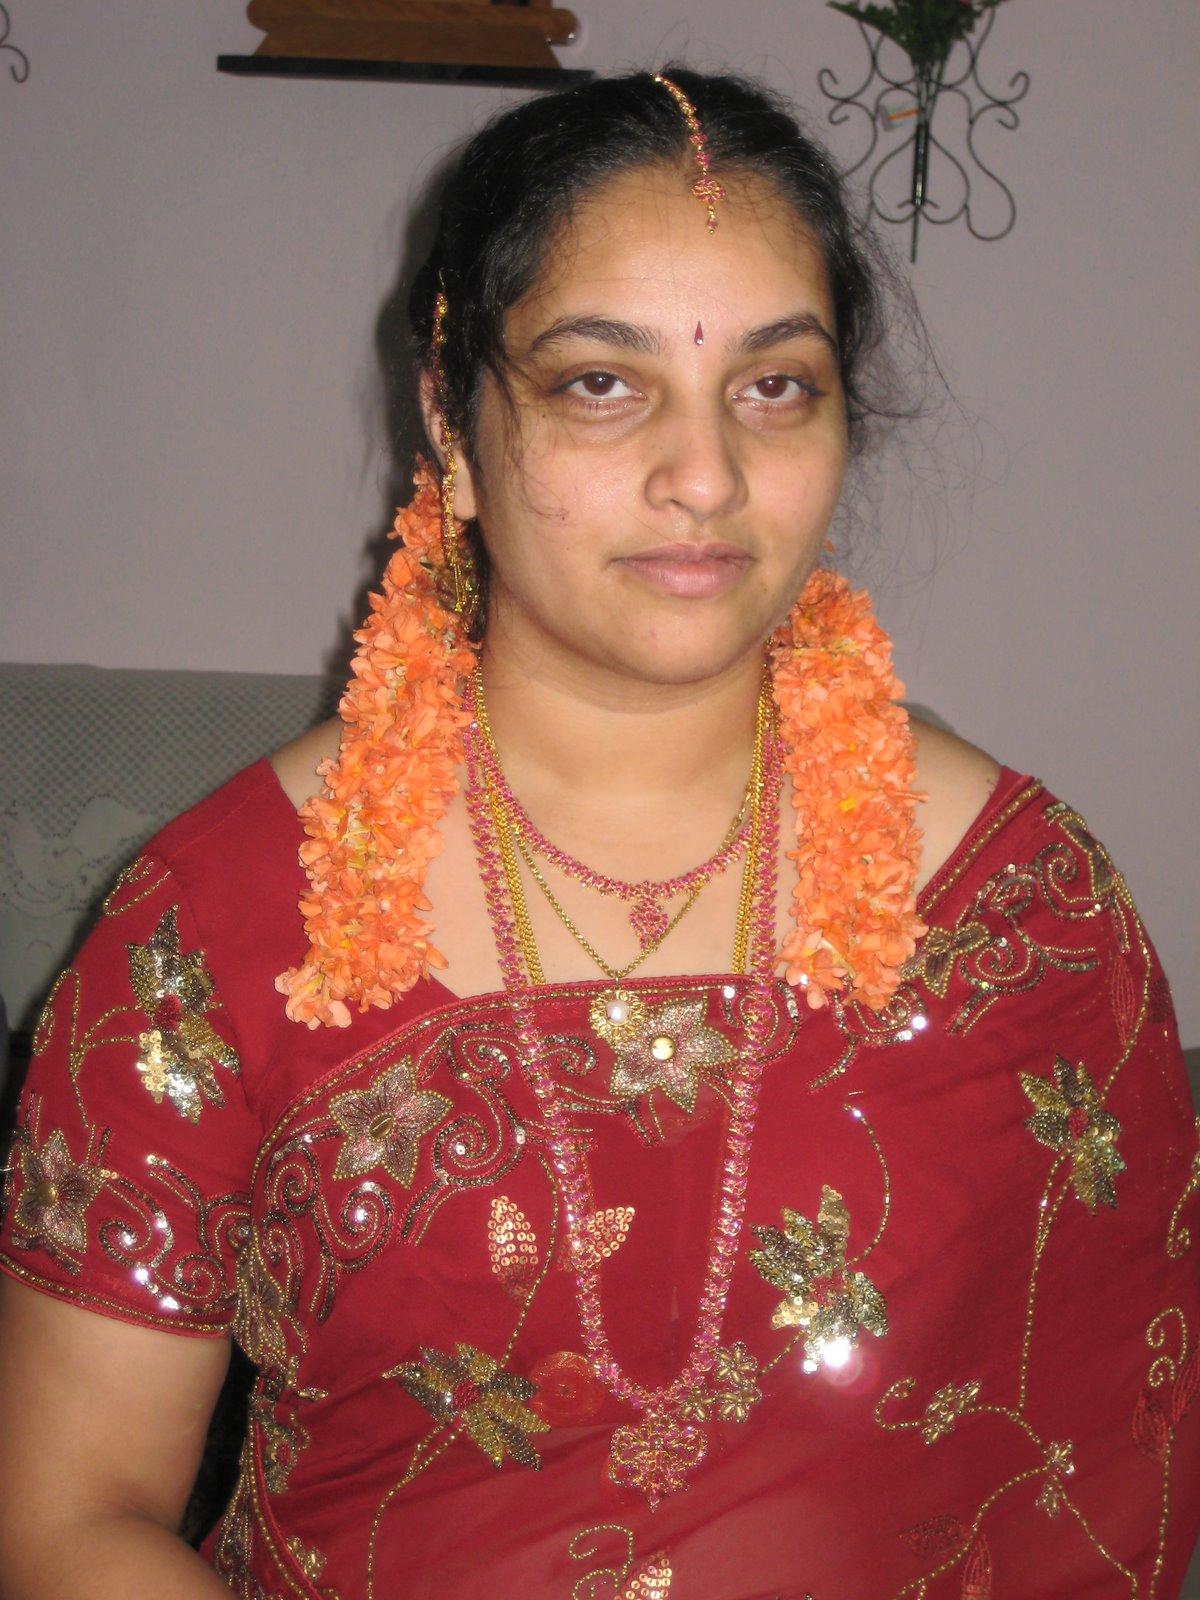 Desi Models - Hot Indian Beauties Desi Models Update-8535